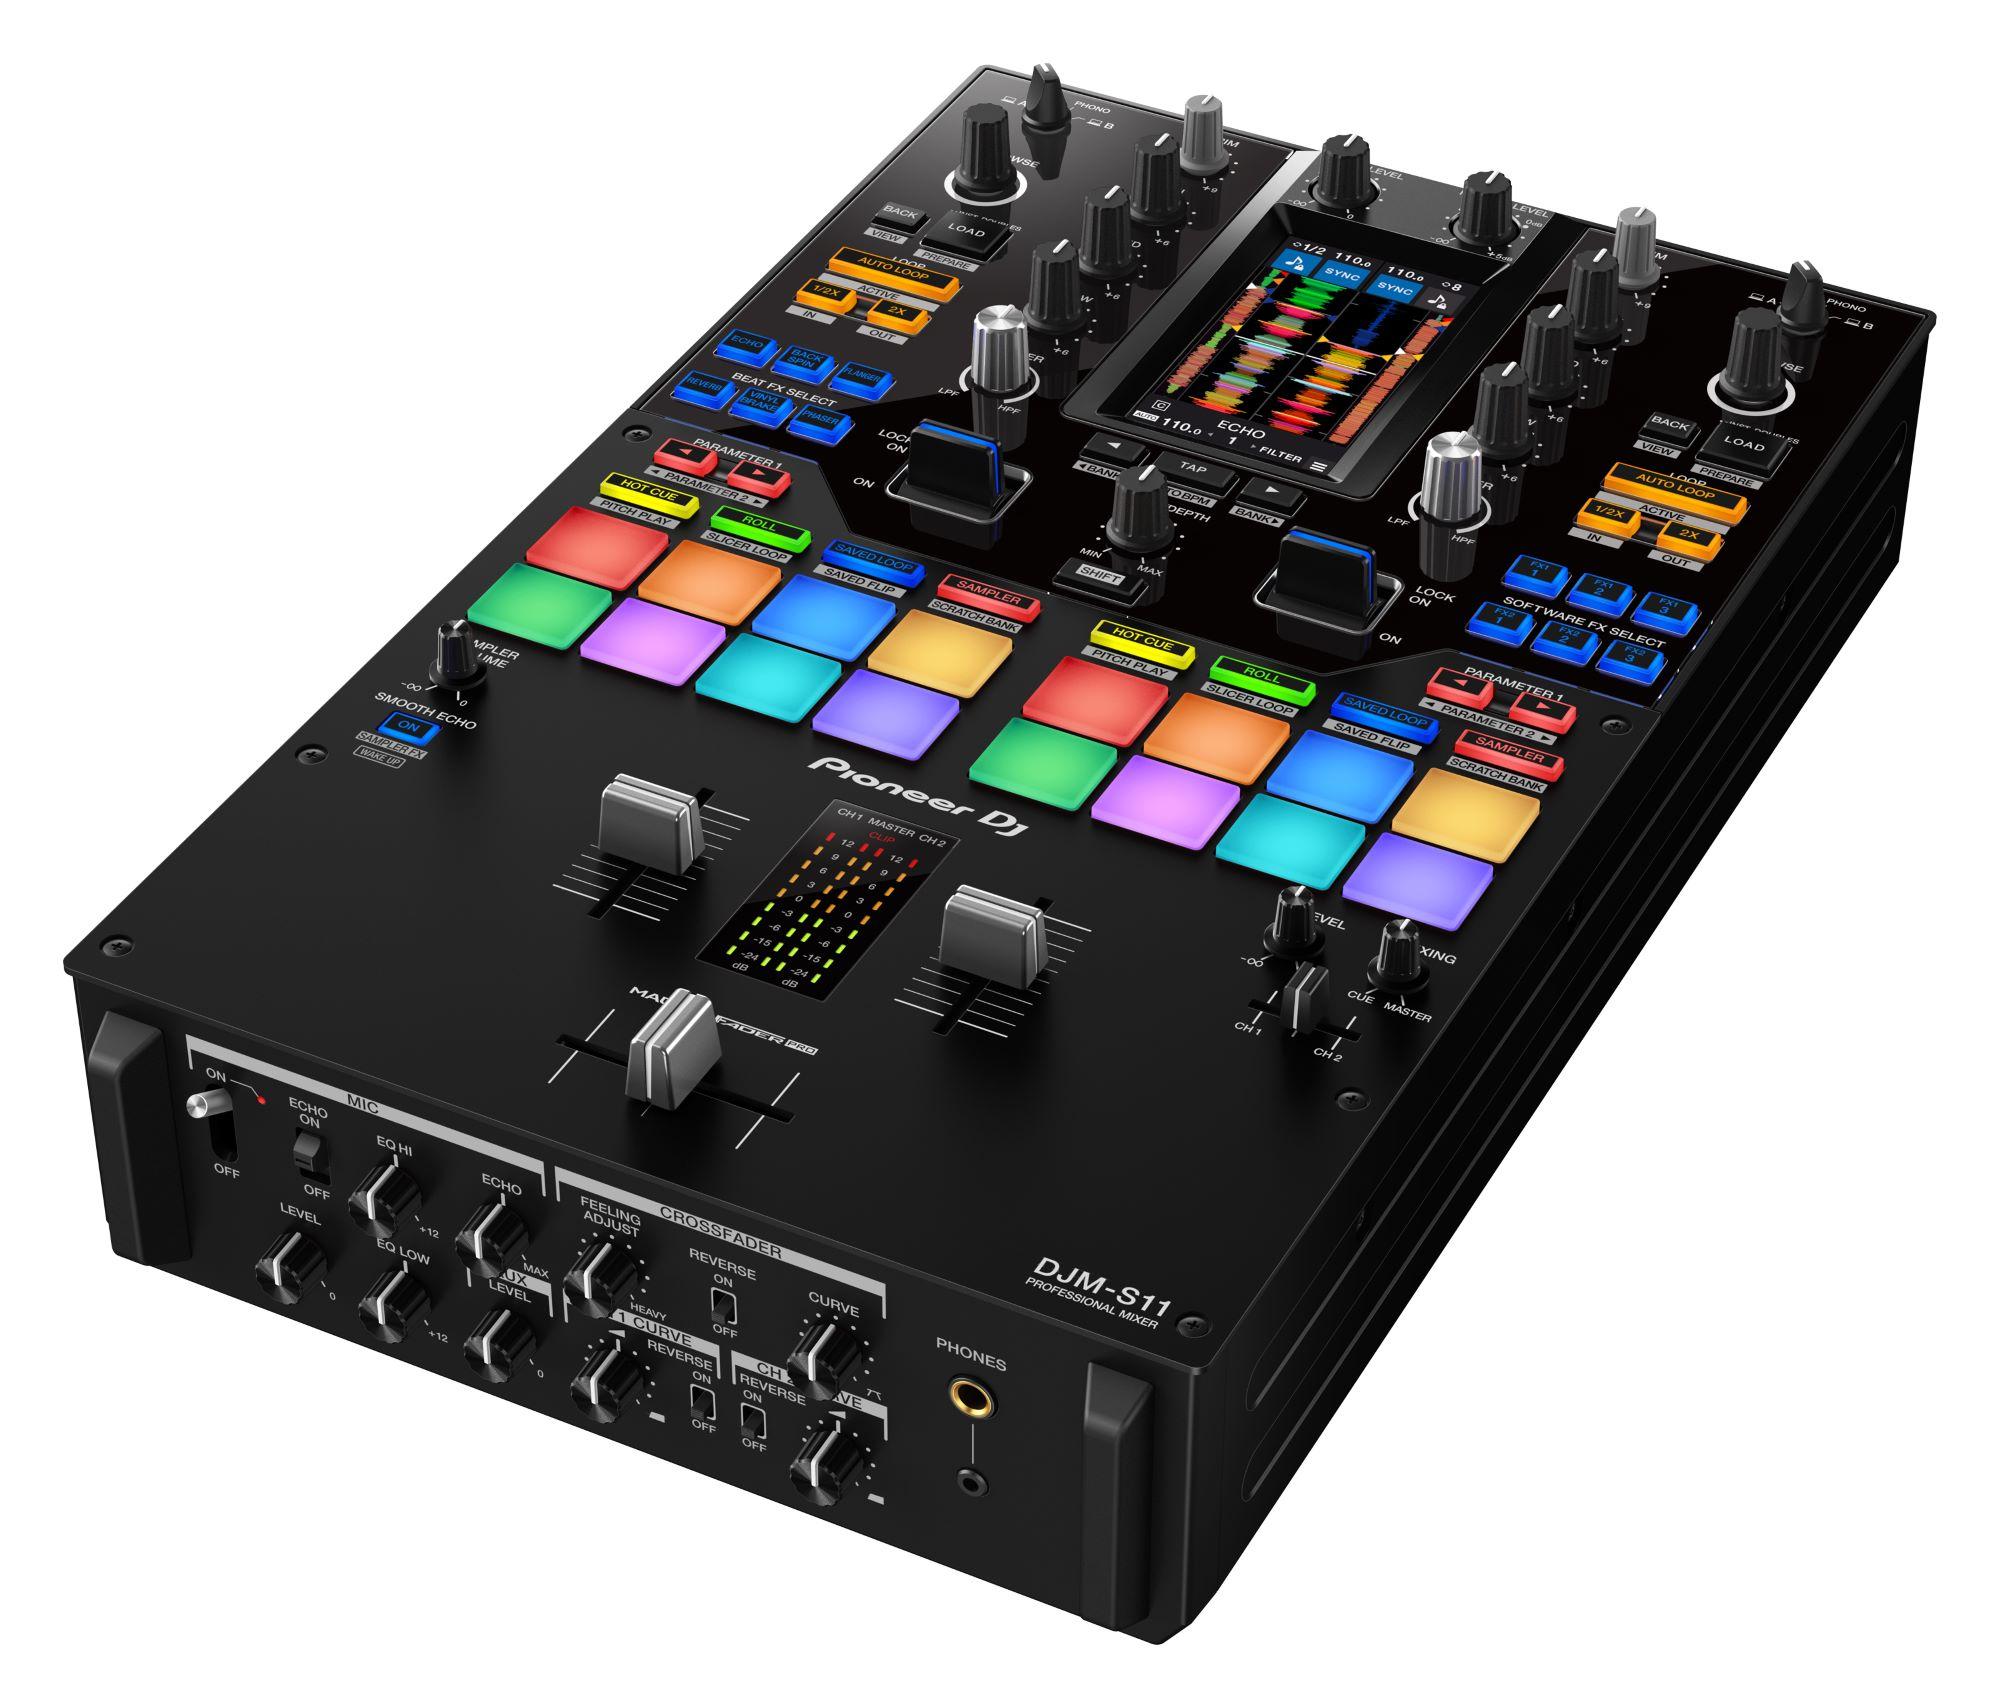 Djmixer - Pioneer DJ DJM S11 - Onlineshop Musikhaus Kirstein